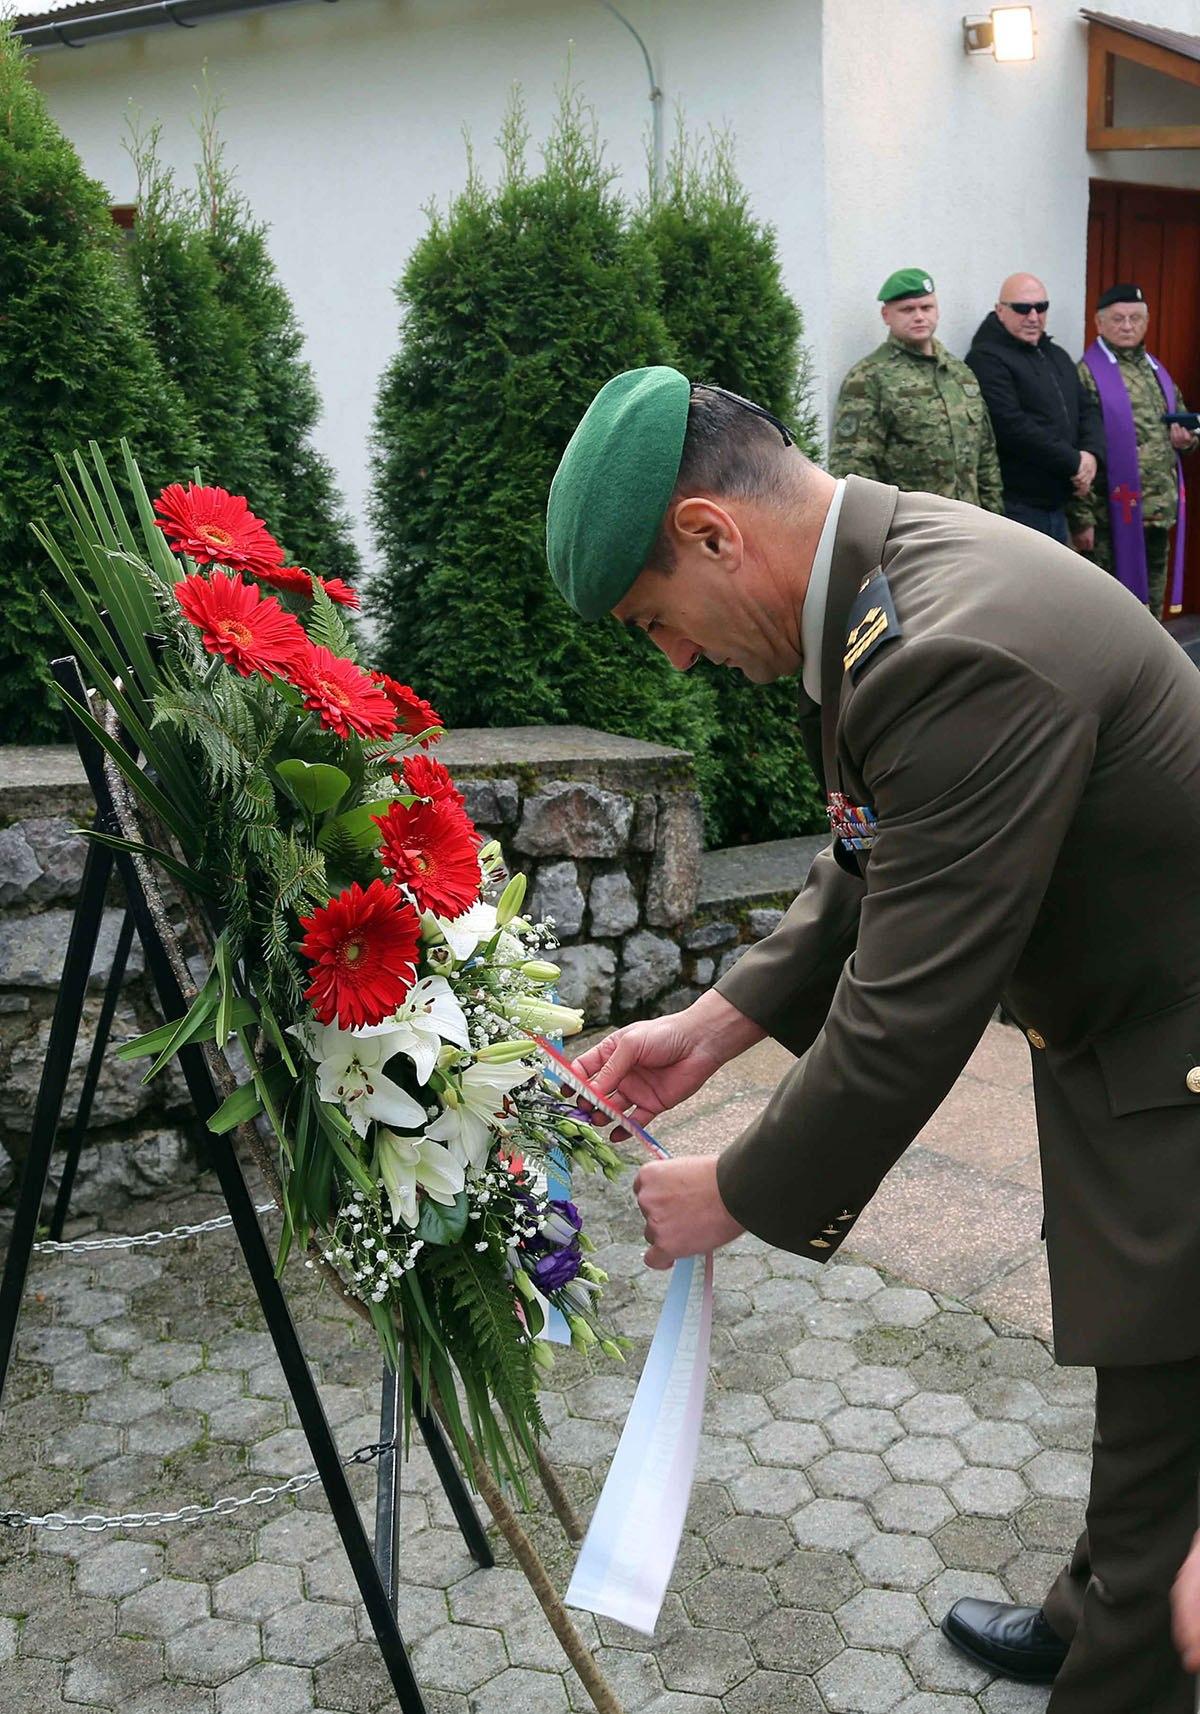 Obilježena obljetnica Vojne kapelanije ZSS-a